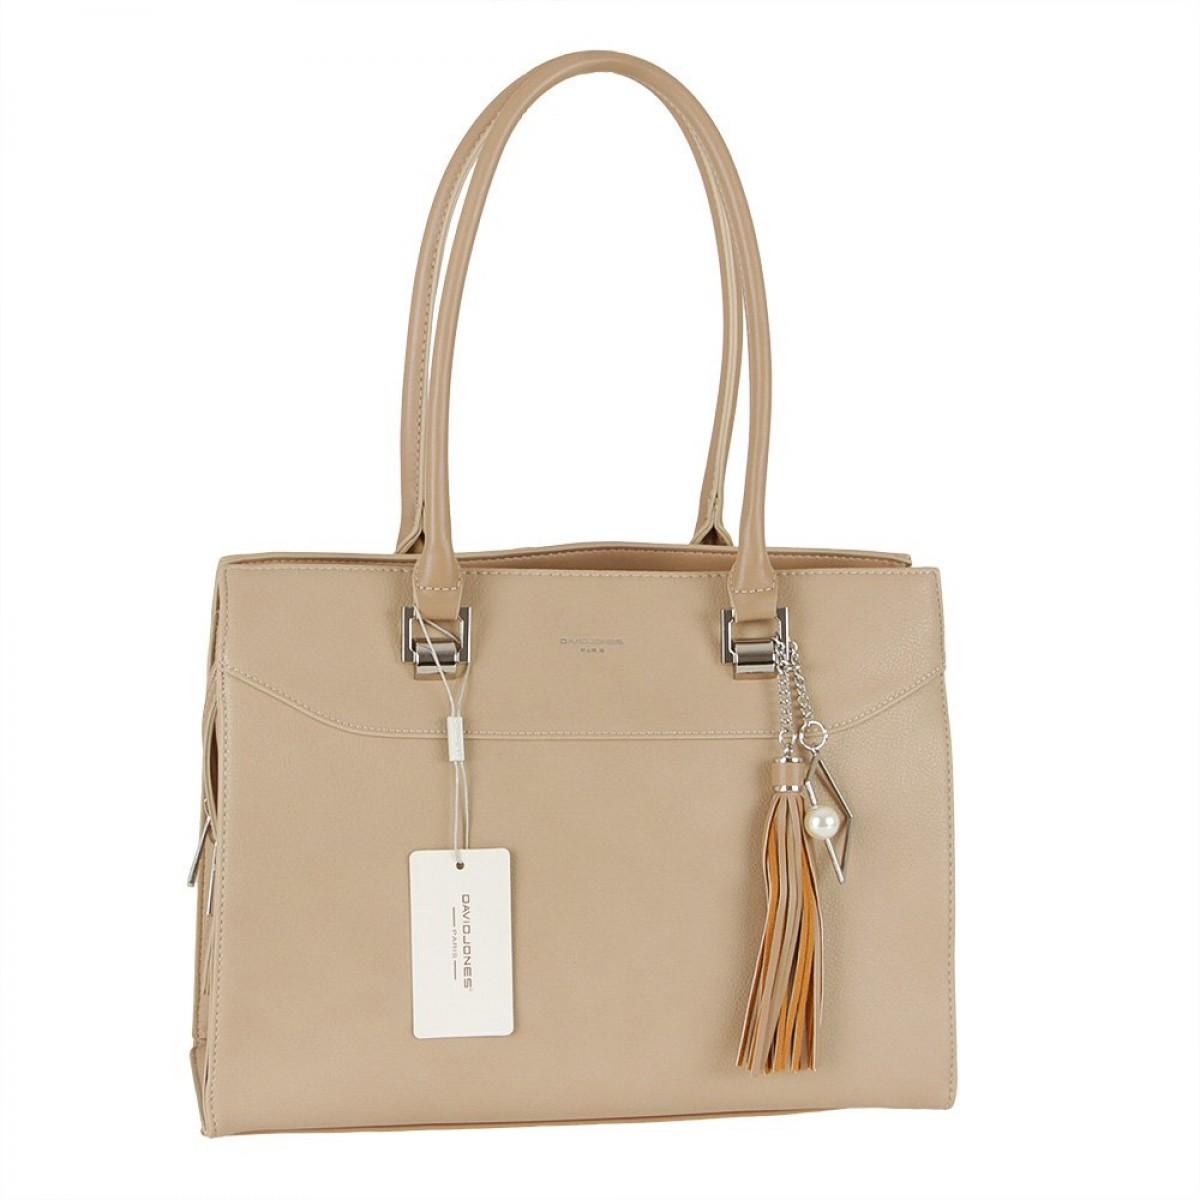 Жіноча сумка David Jones CM5705 L.CAMEL